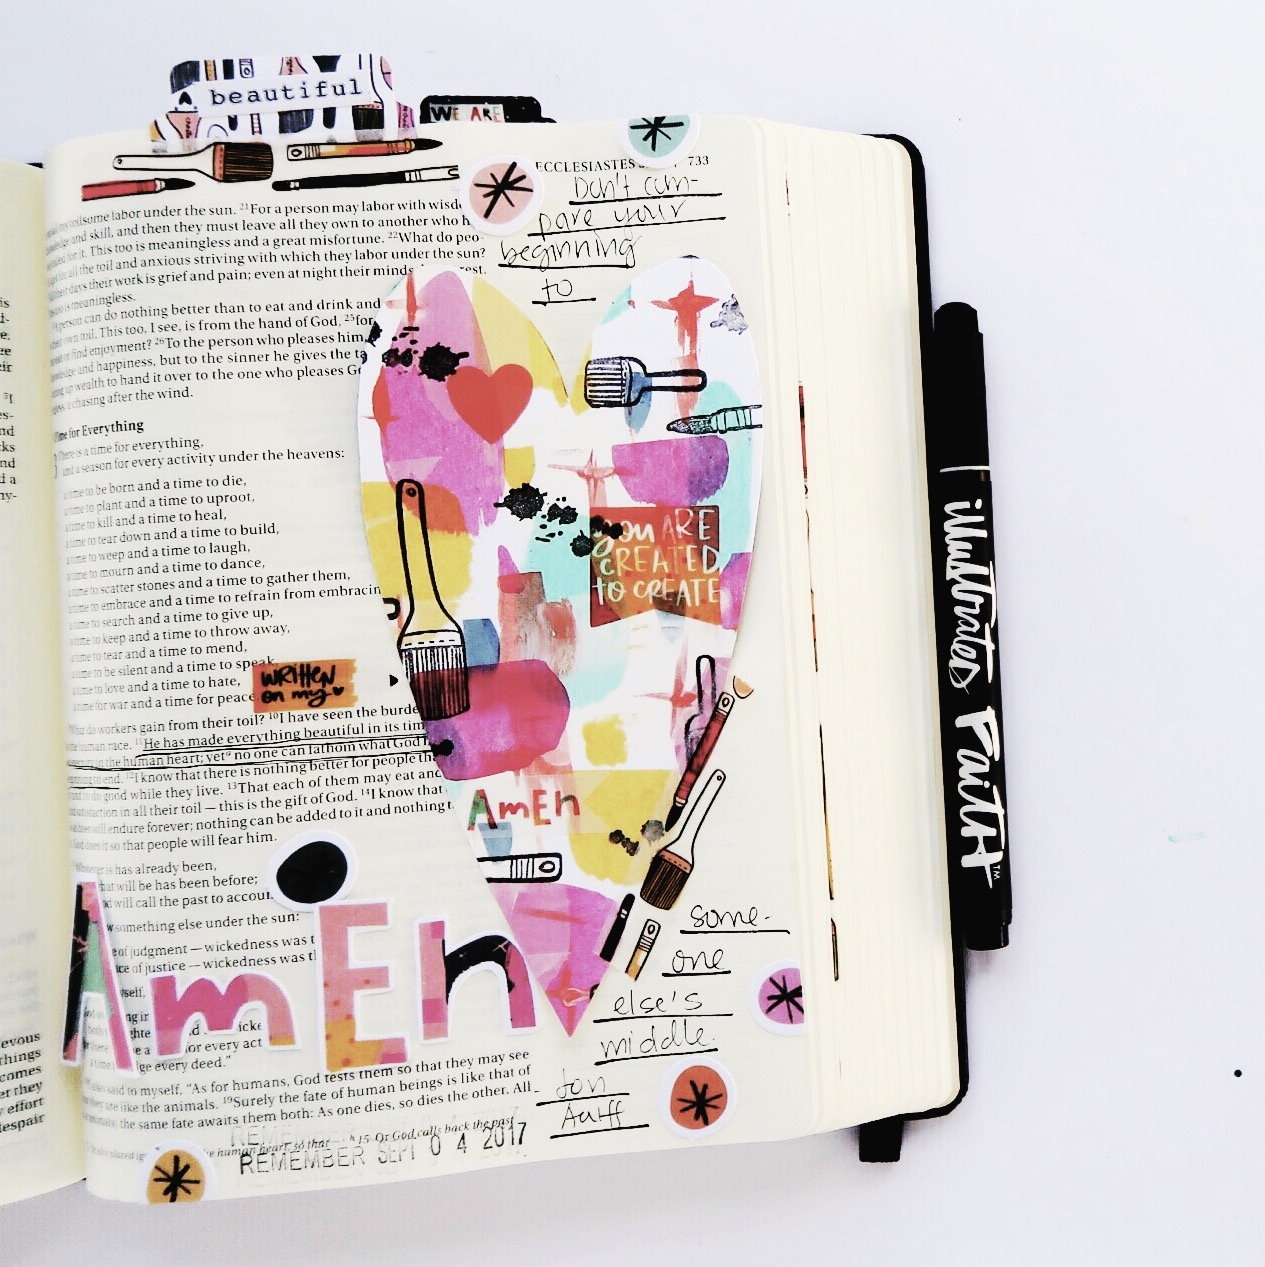 mixed media DIY Bible journaling tip-in by Jillian Ungerbuehler   Created to Create week 3   process video